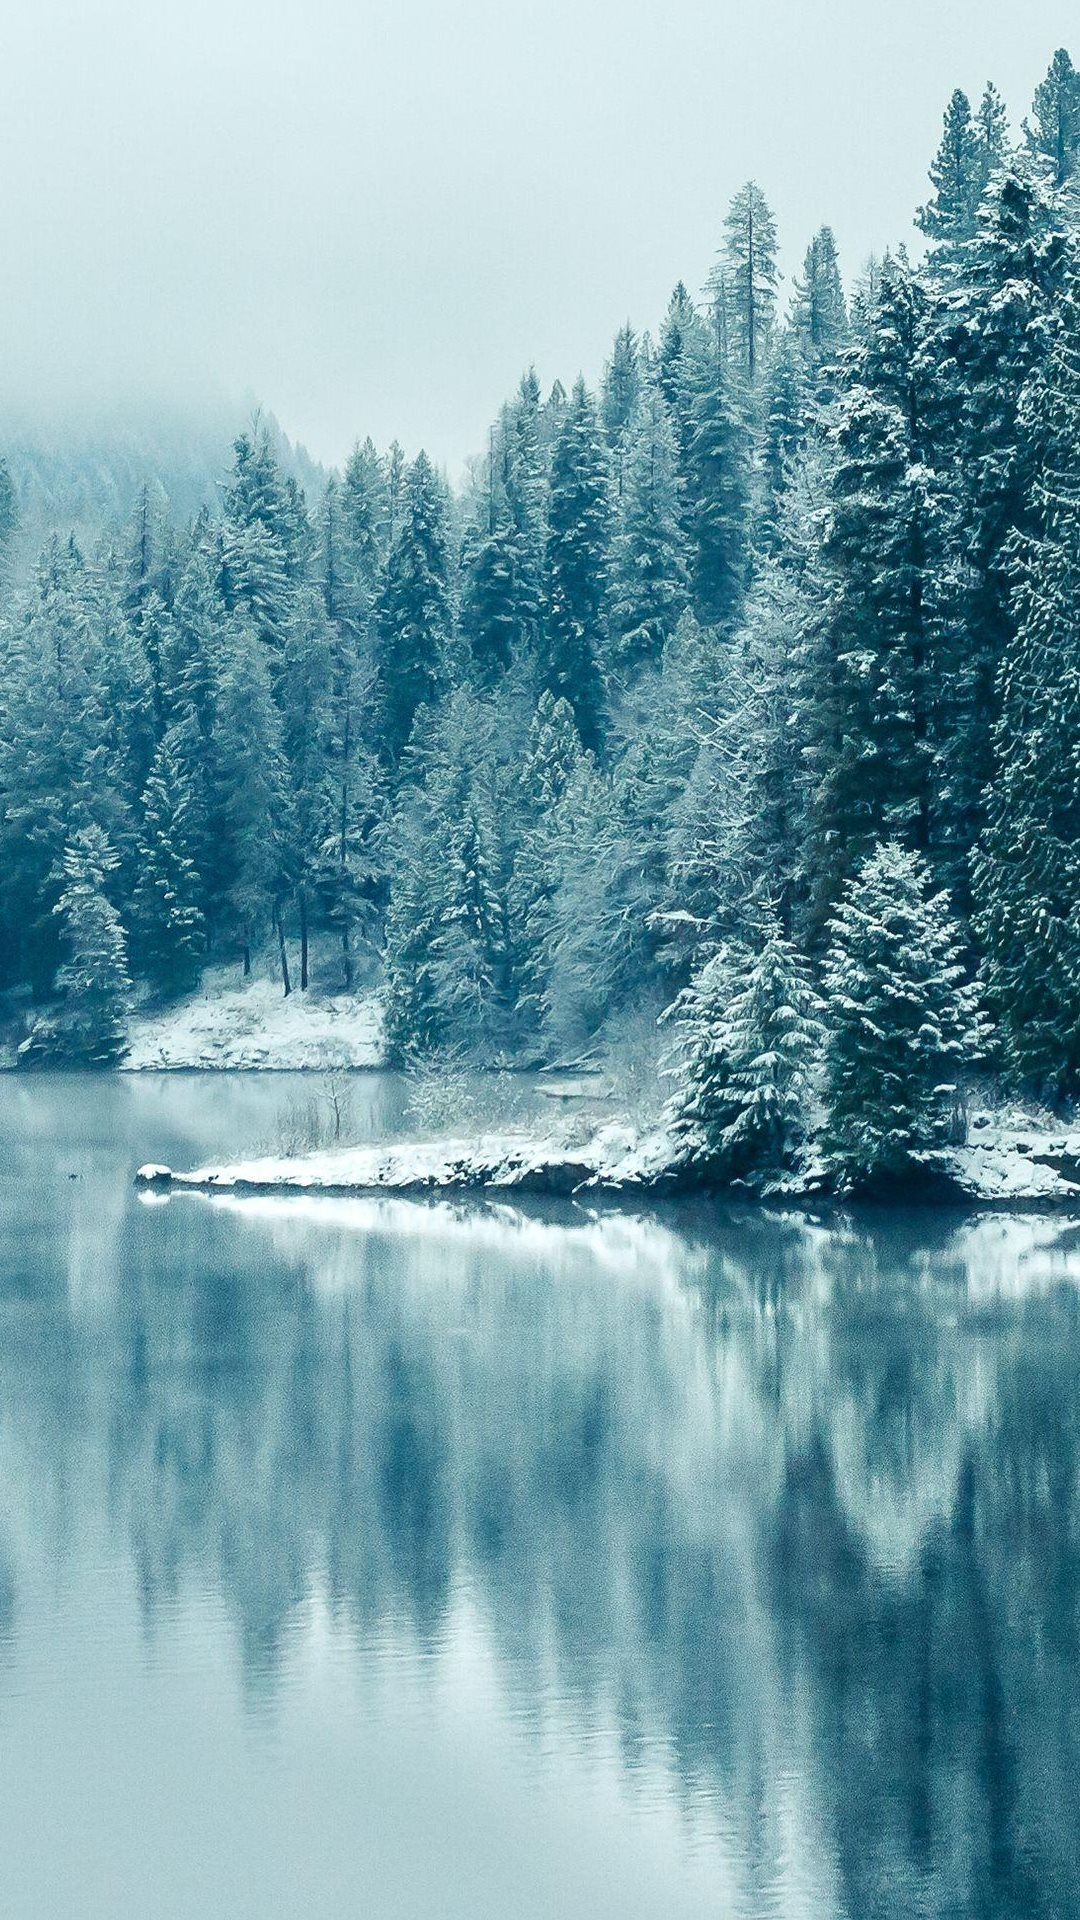 iPhone wallpaper frozen lake Lake